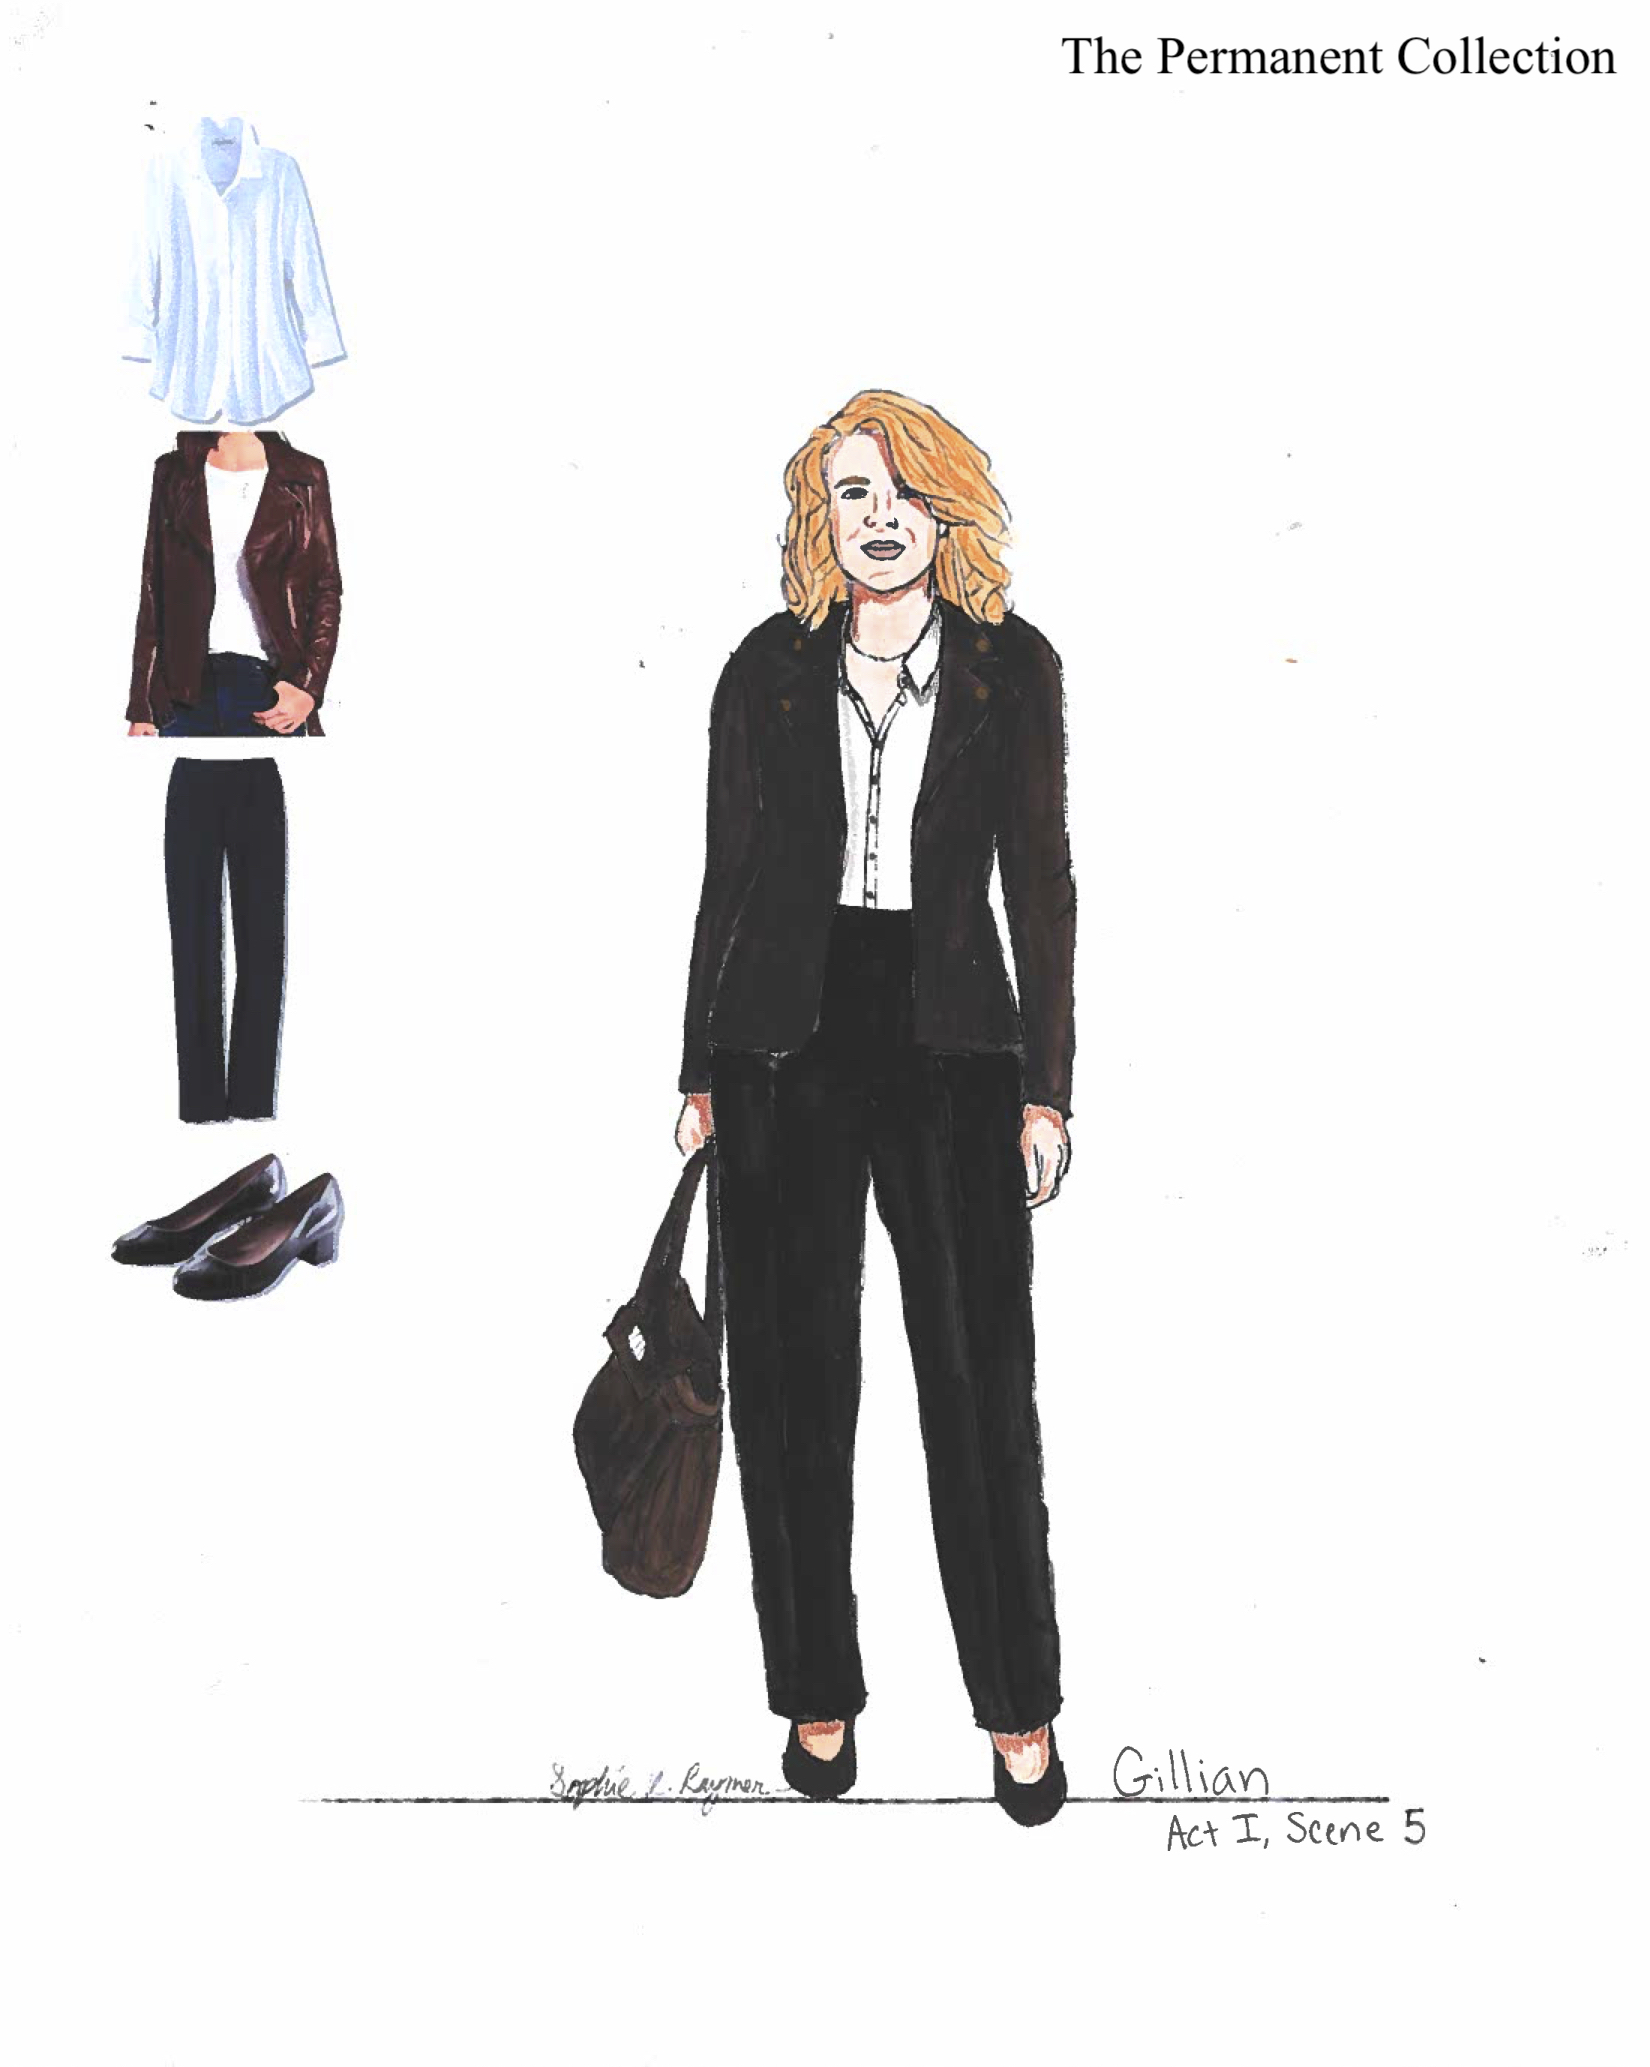 Gillian Act 1, Scene 5.jpg